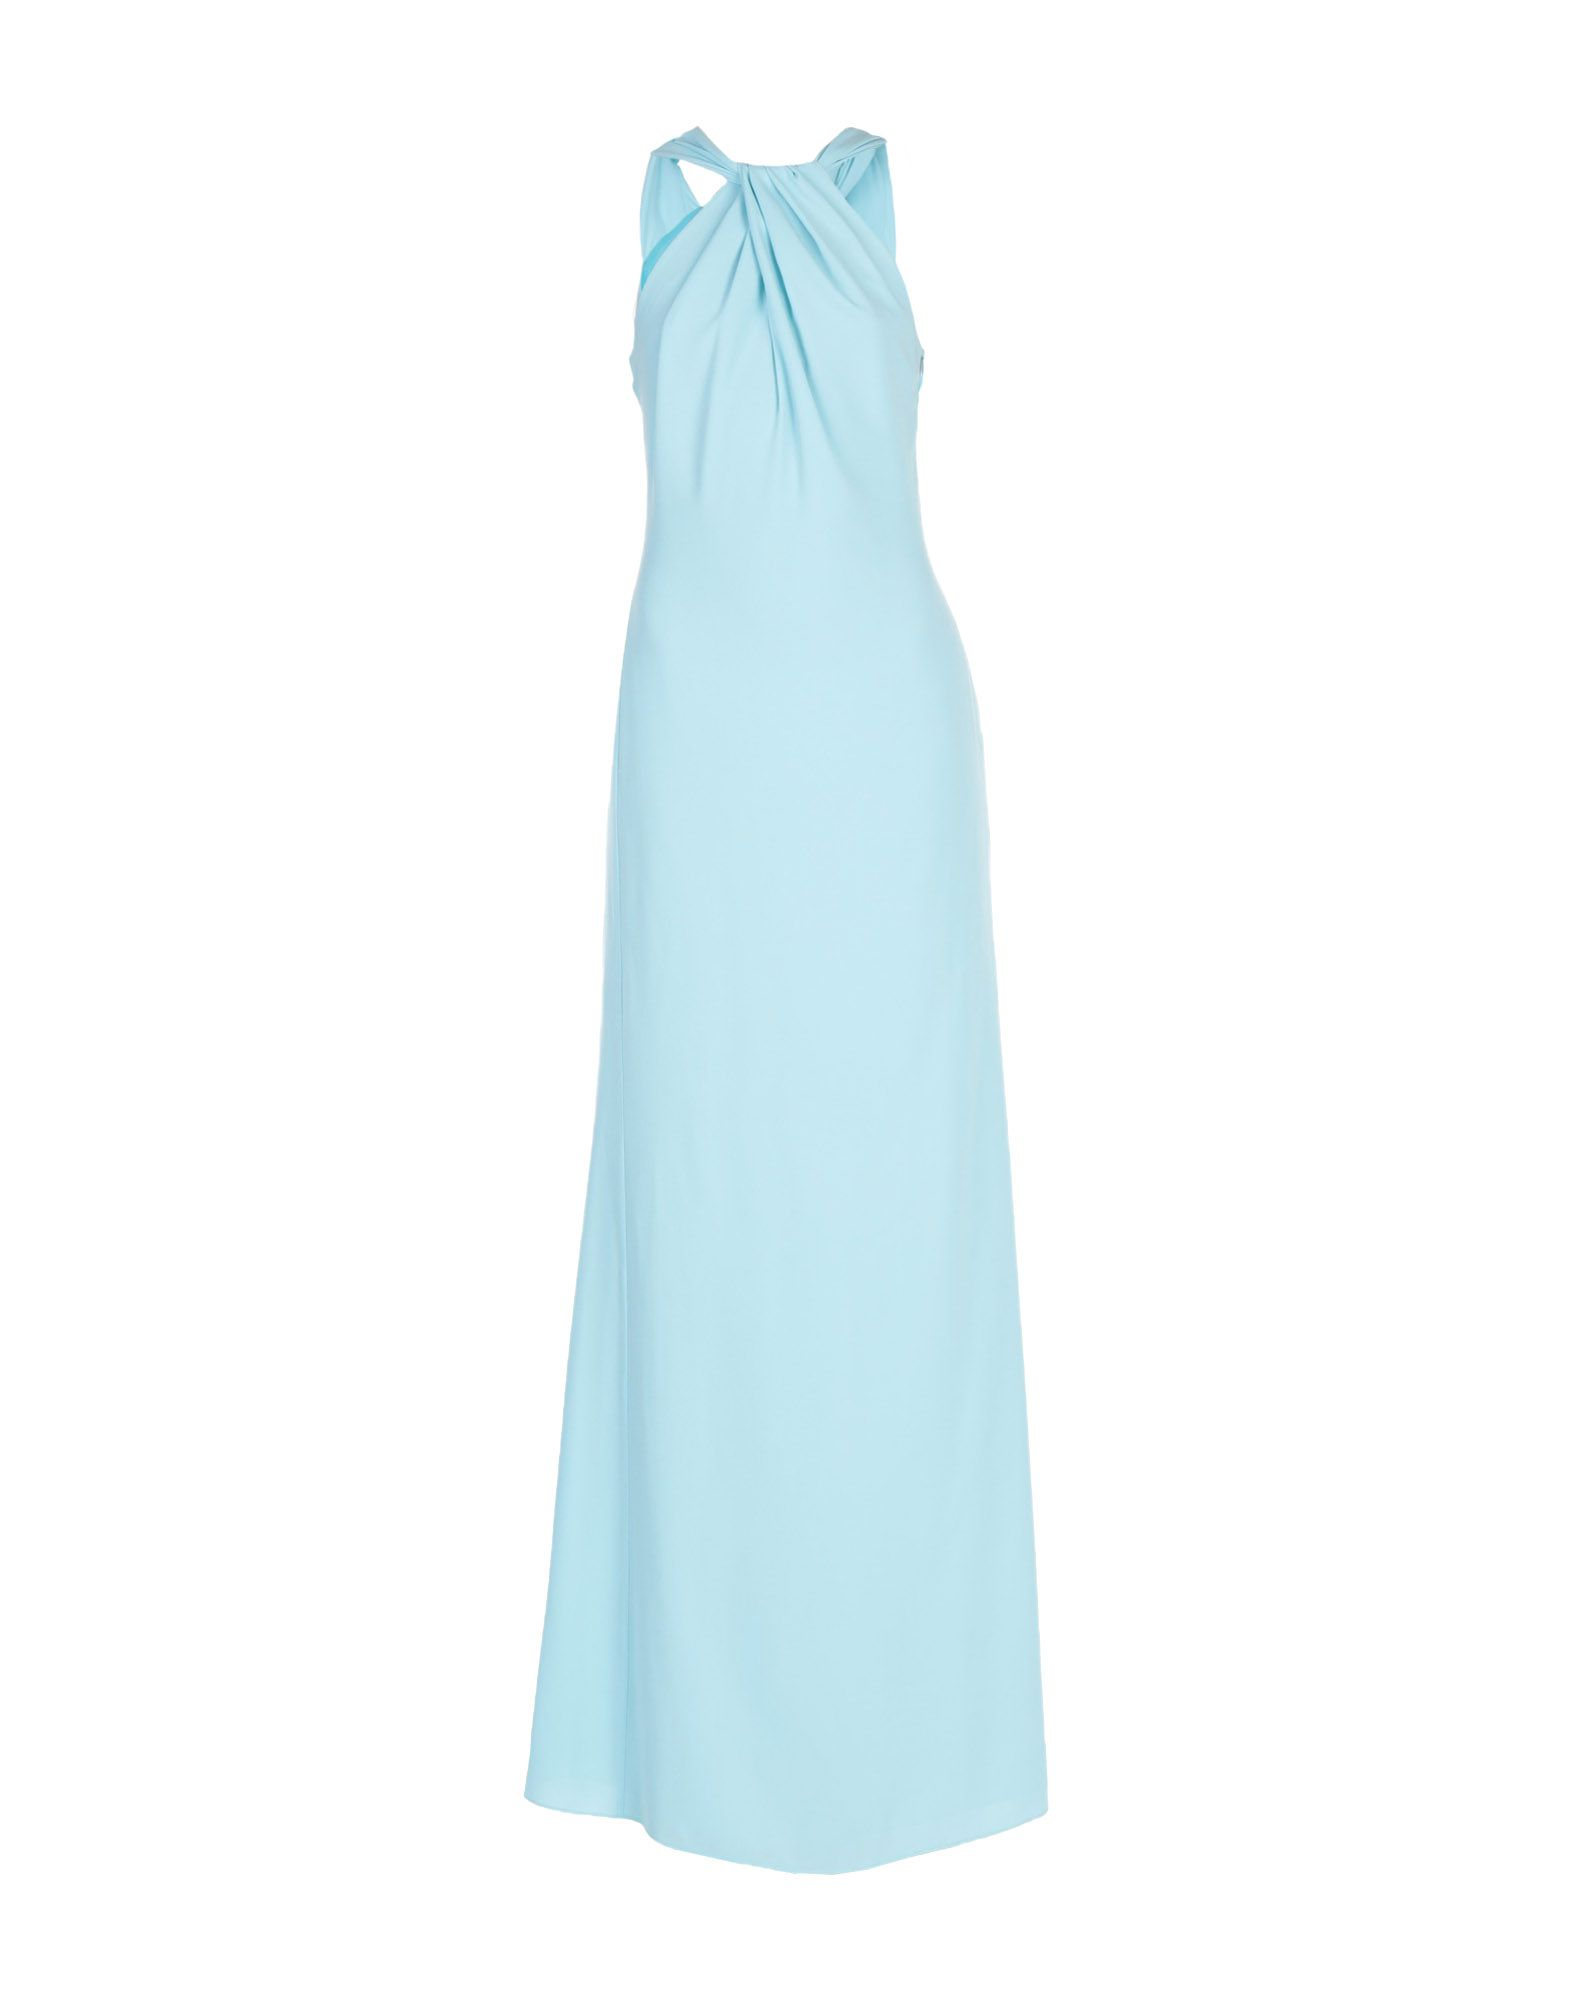 BOUTIQUE MOSCHINO Длинное платье